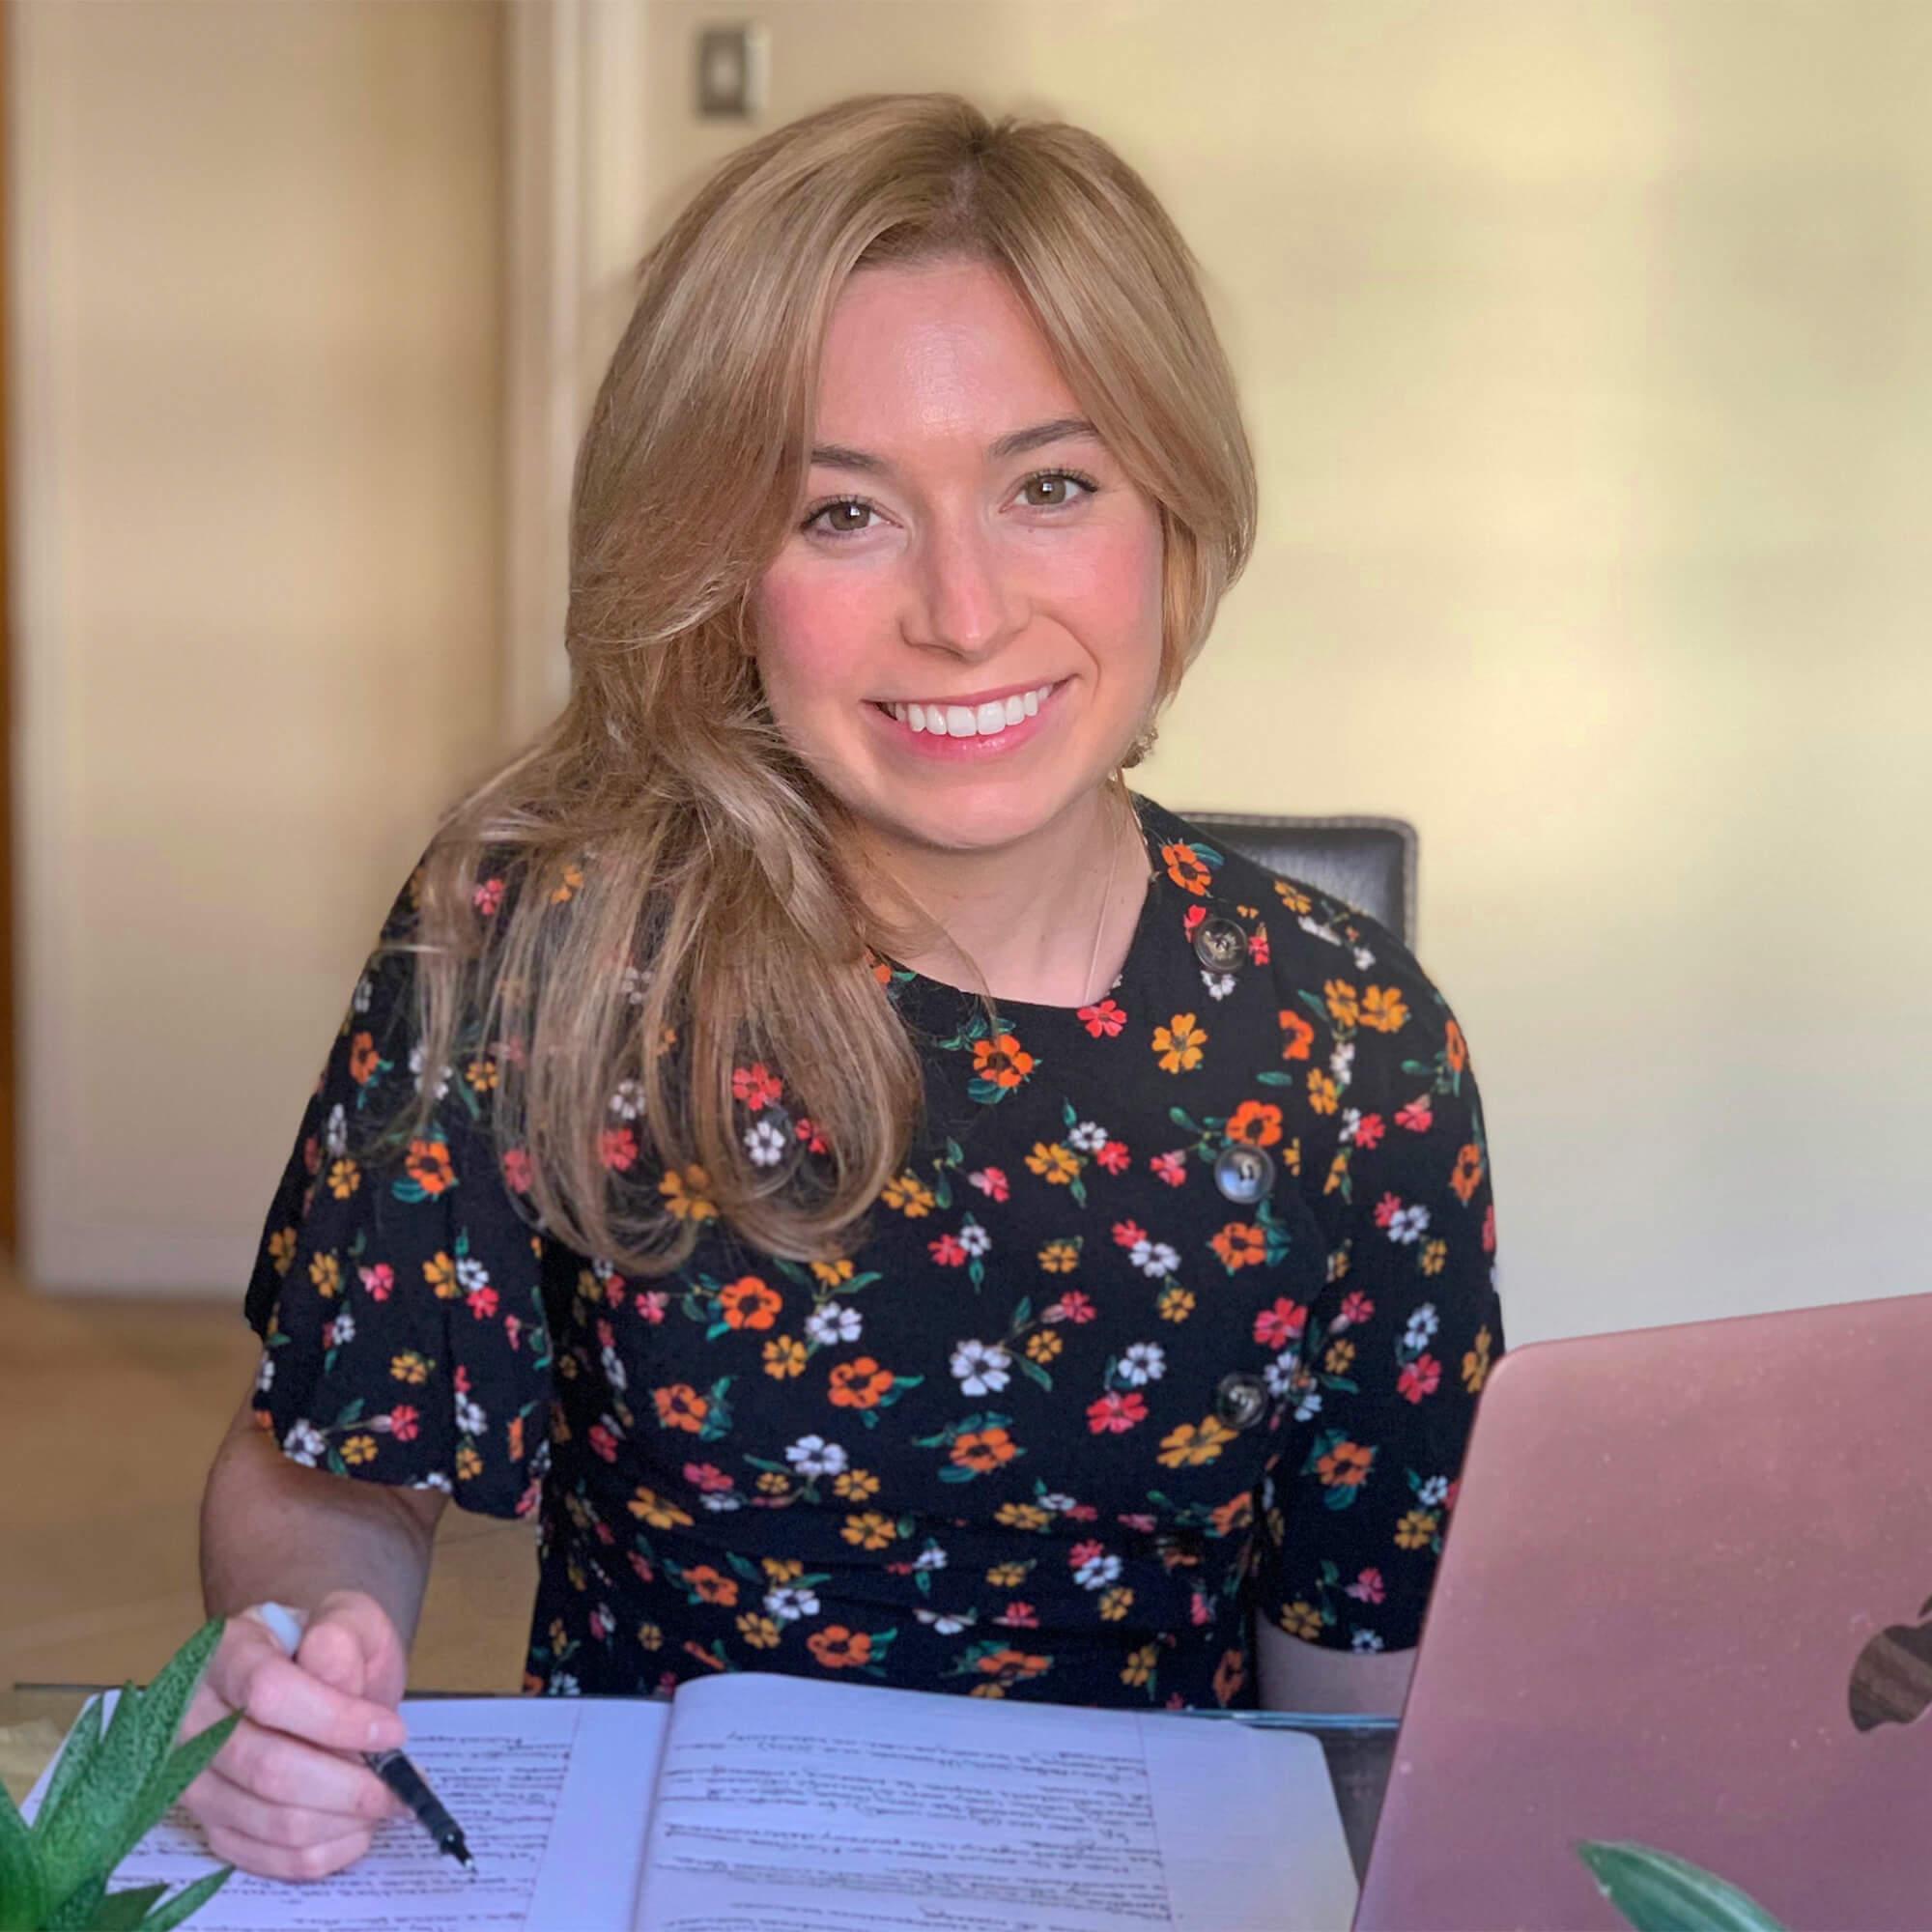 Amanda Ripley writing happily at her desk